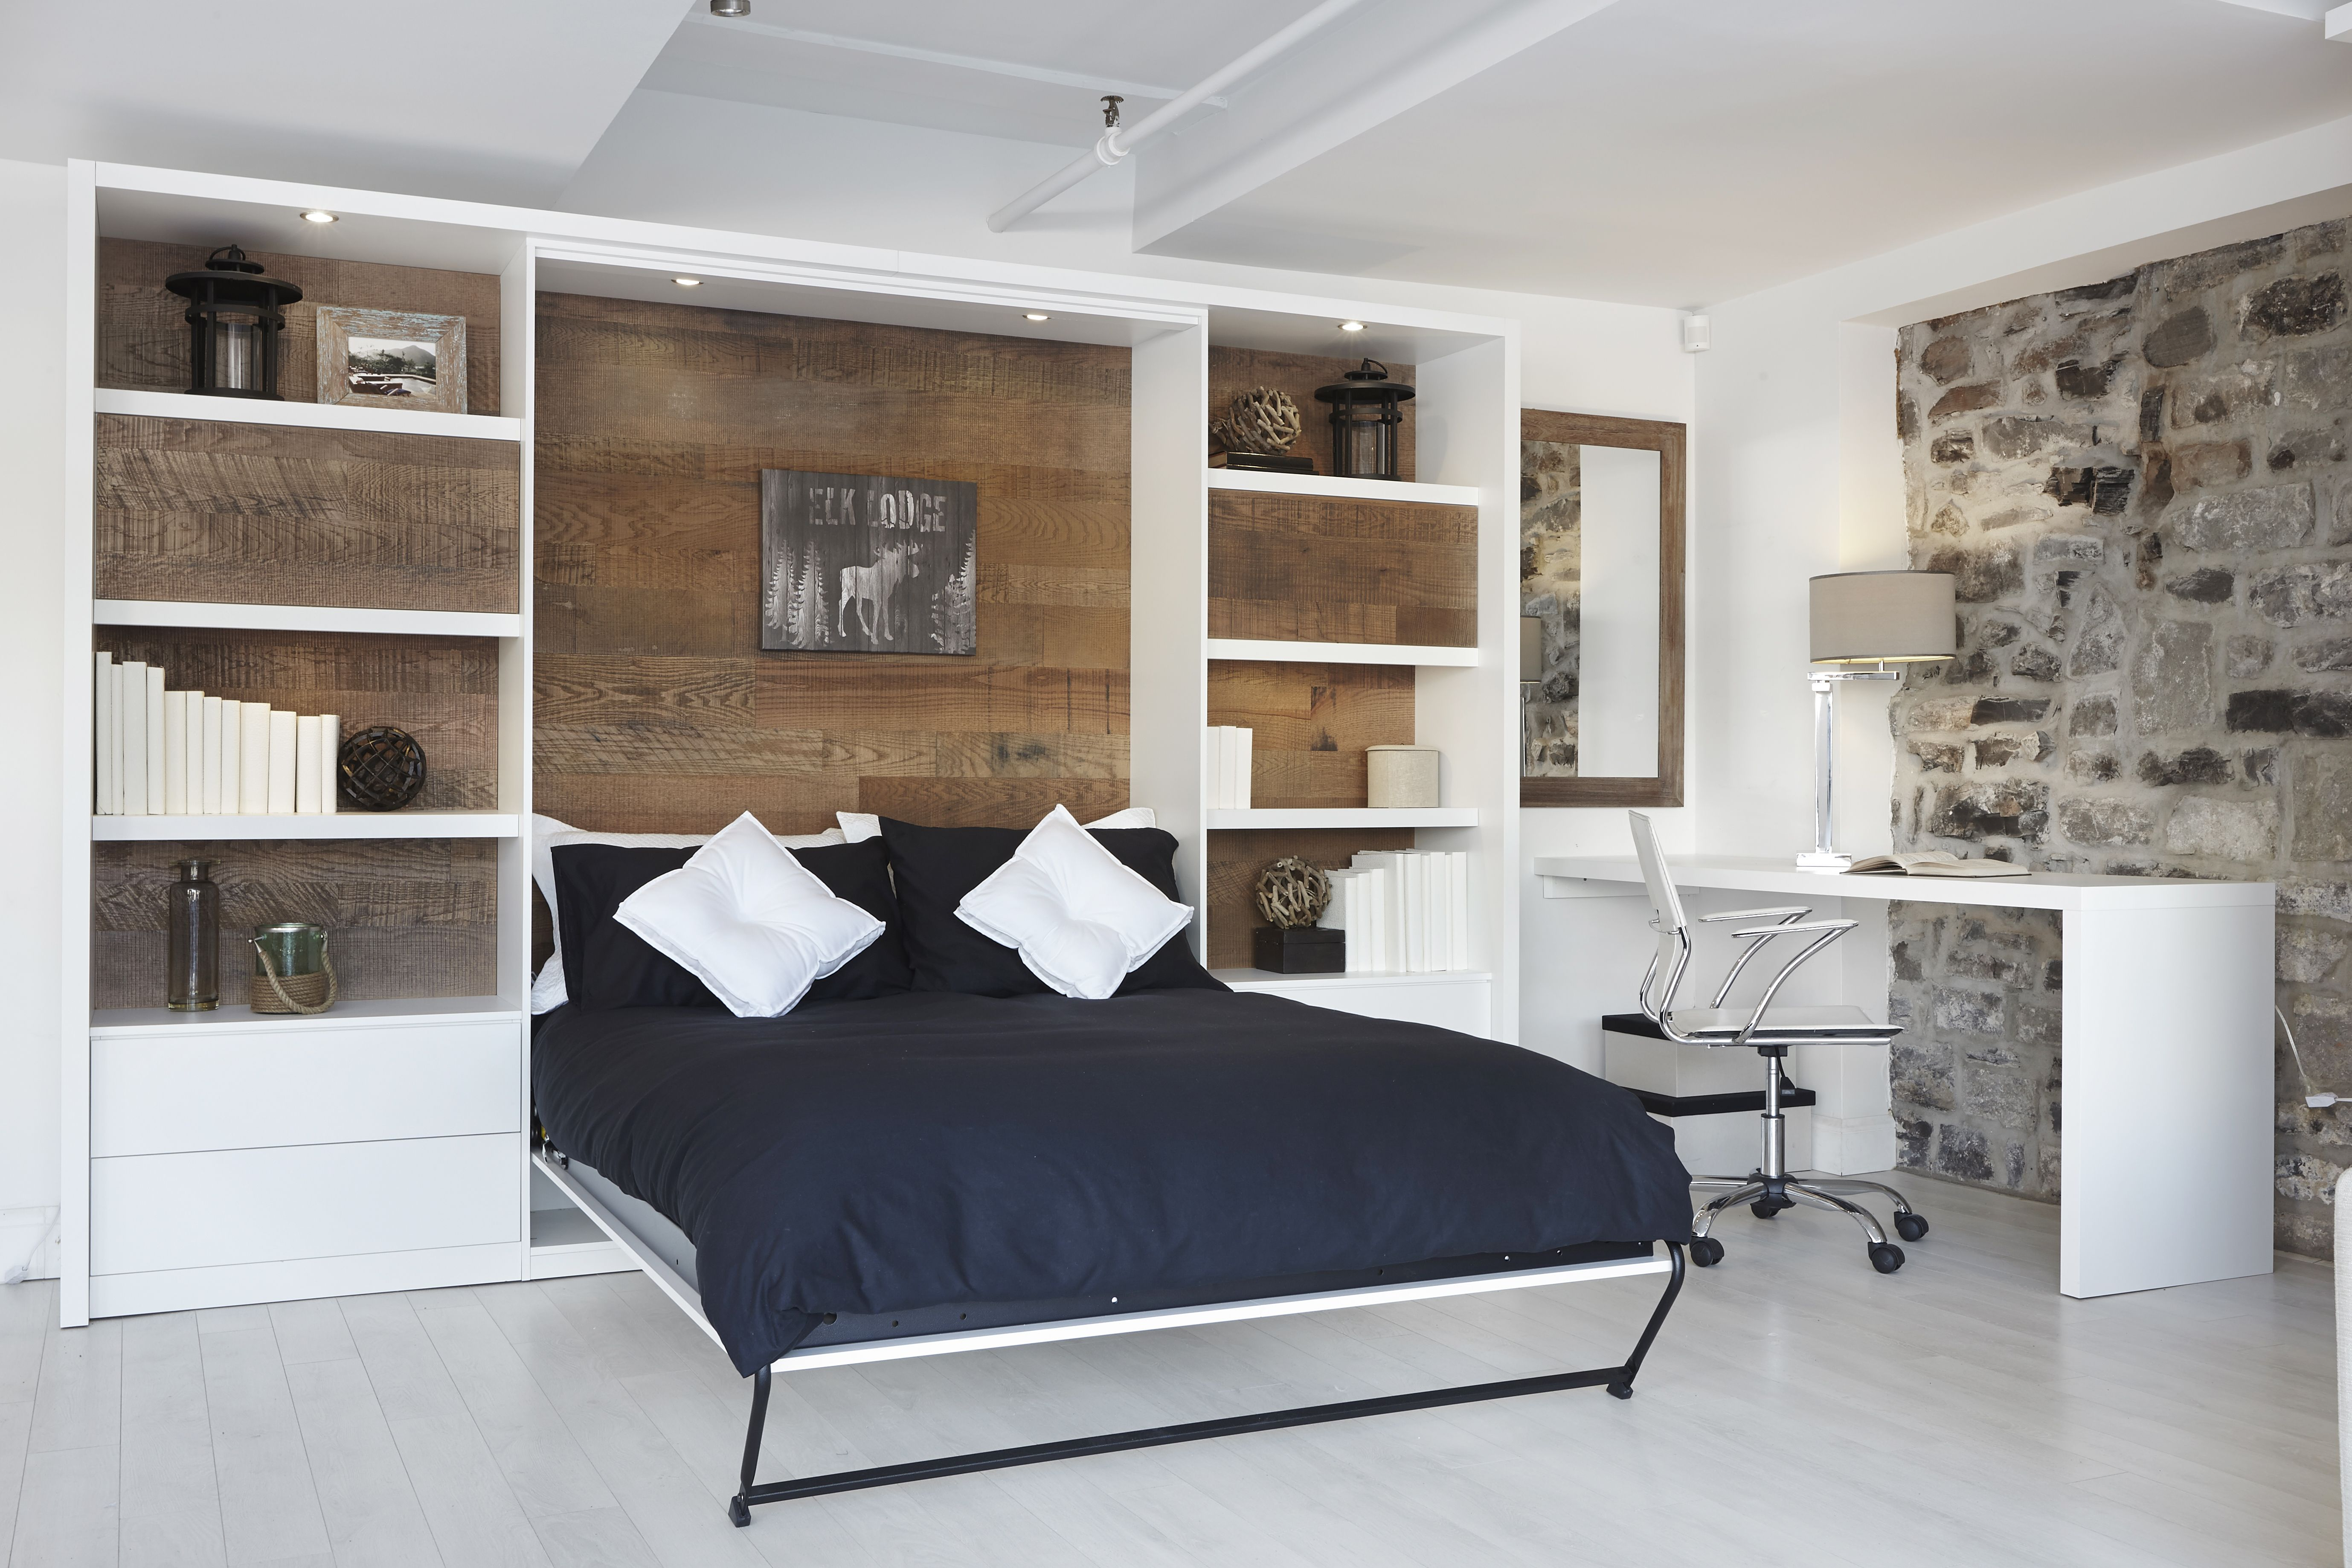 lit mural d ploy wall bed architecture bedroom decor murphy rh pinterest com